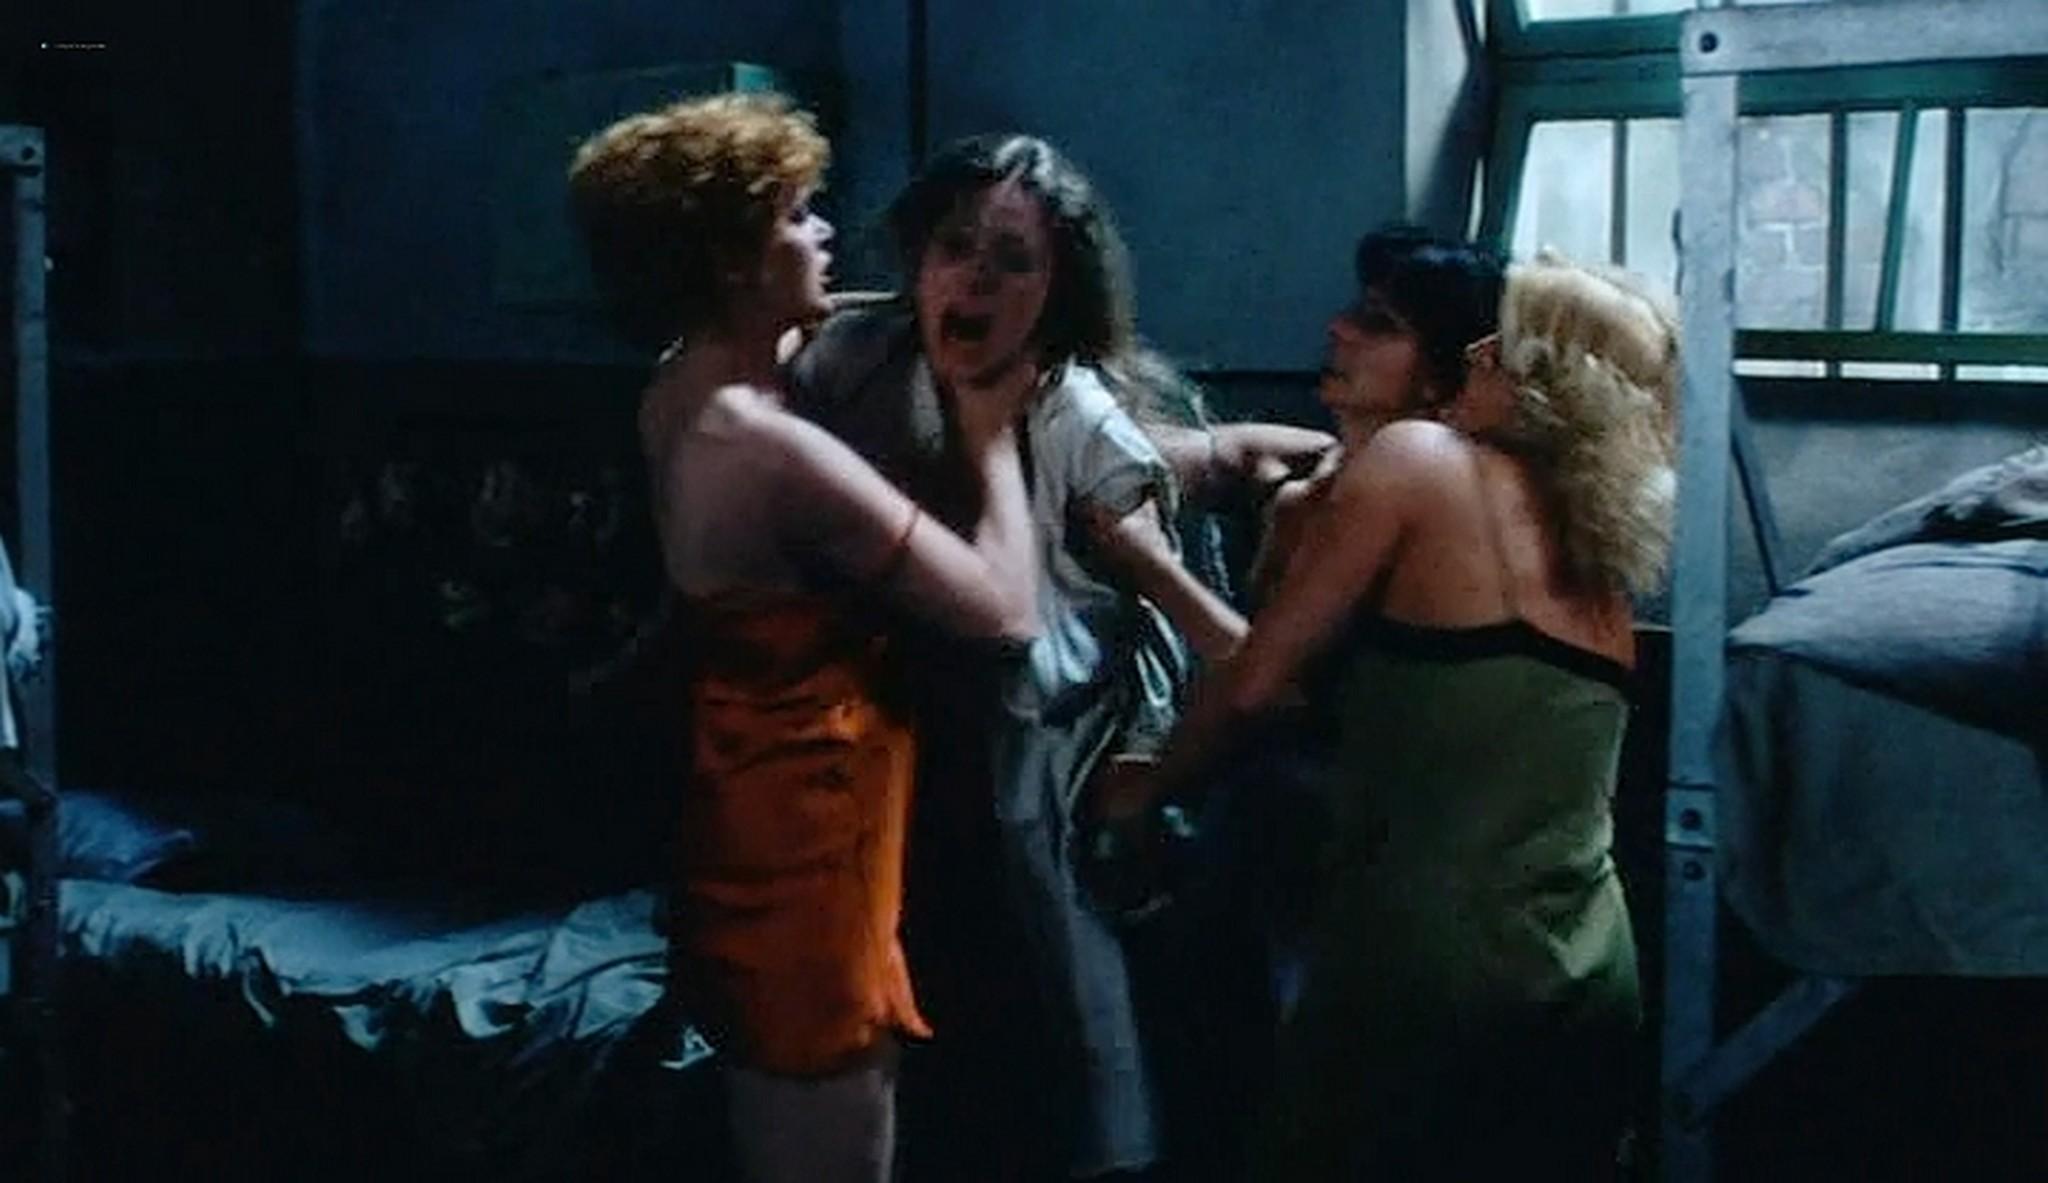 Linda Blair nude sex Sylvia Kristel and others nude too Red Heat 1985 VHSRip 6